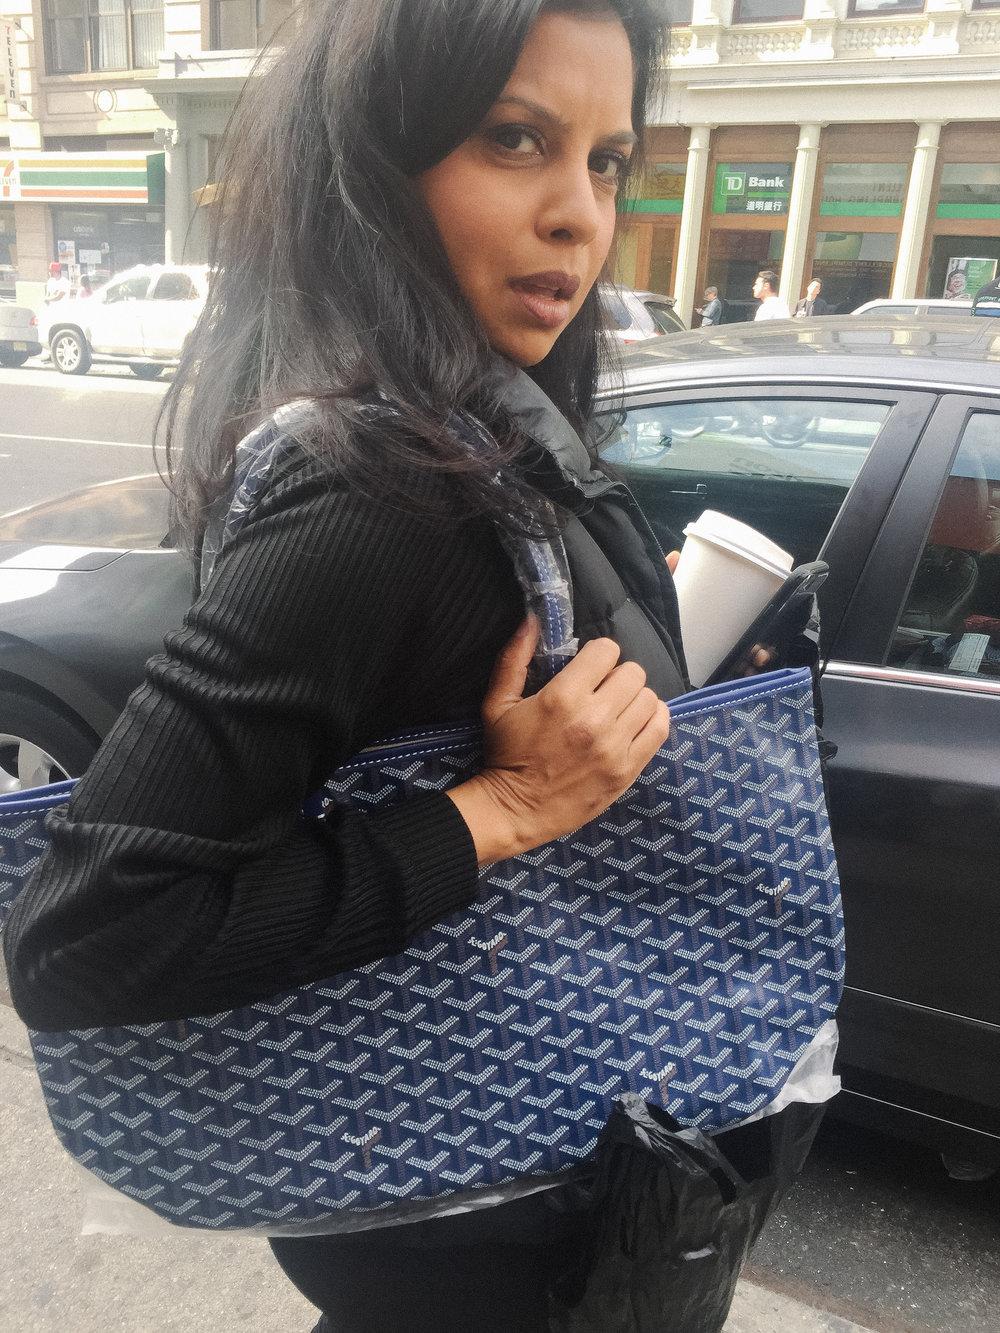 Hitha Herzog carrying a fake Goyard handbag in Chinatown